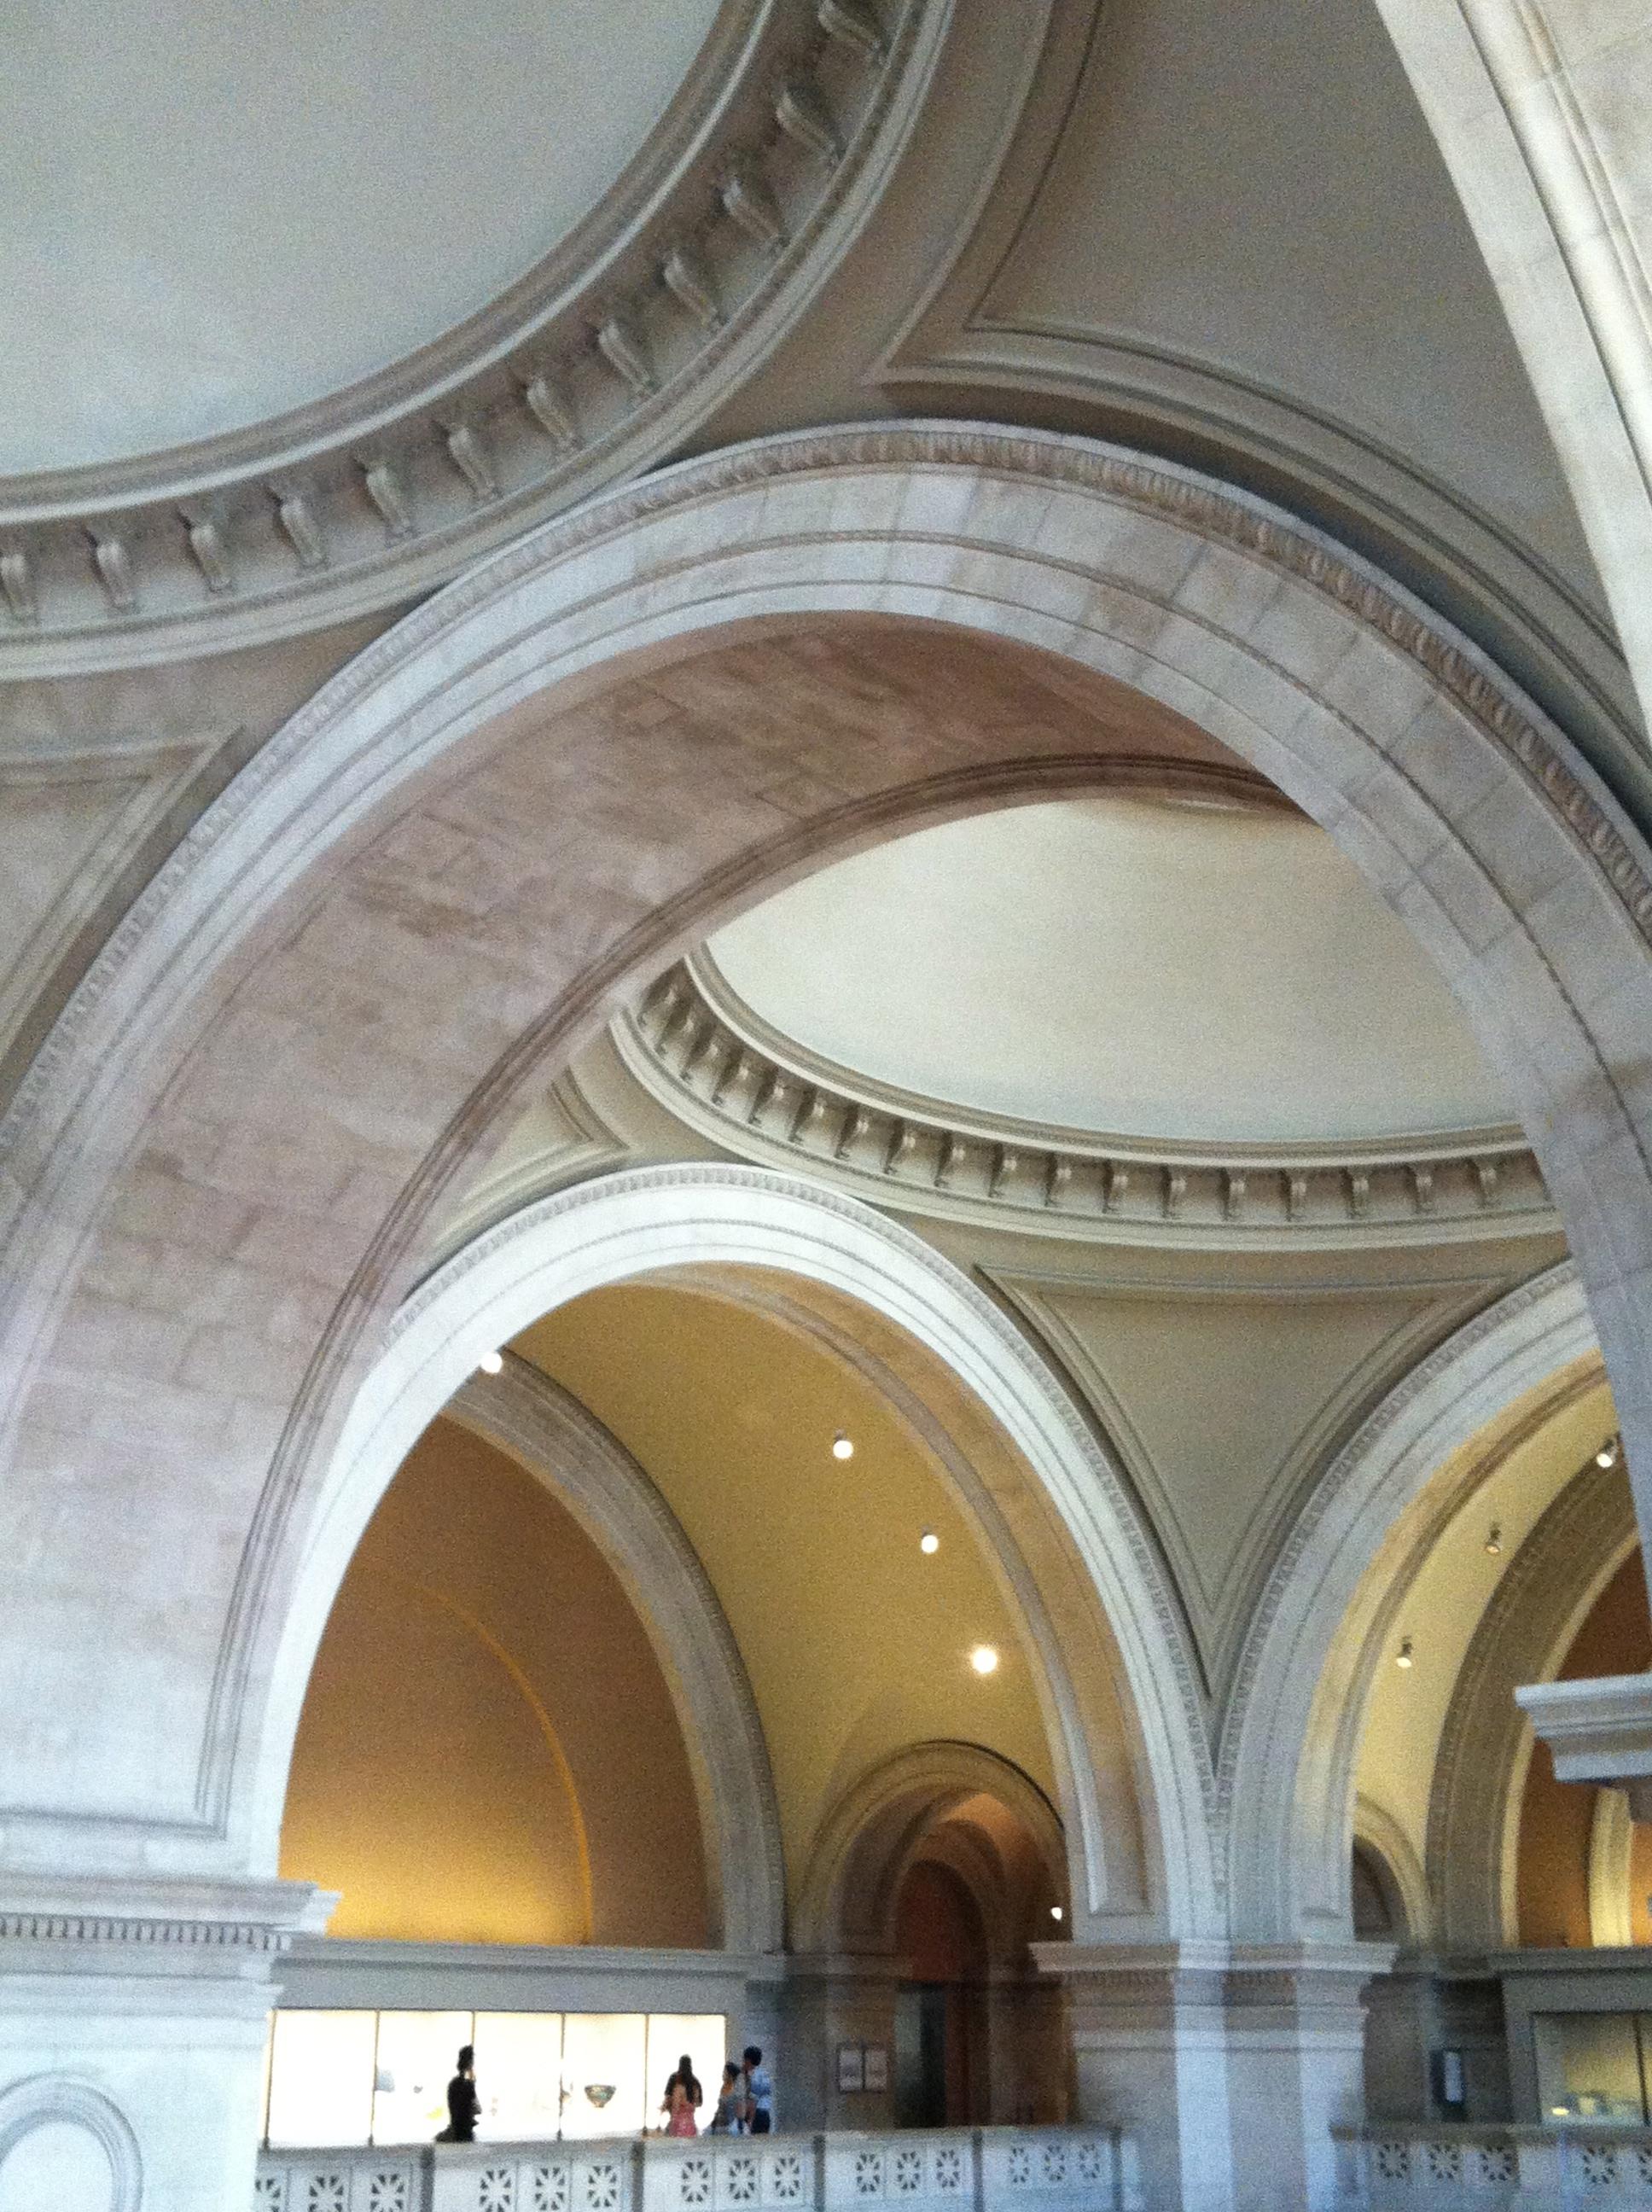 Metropolitan Museum, from the balcony.